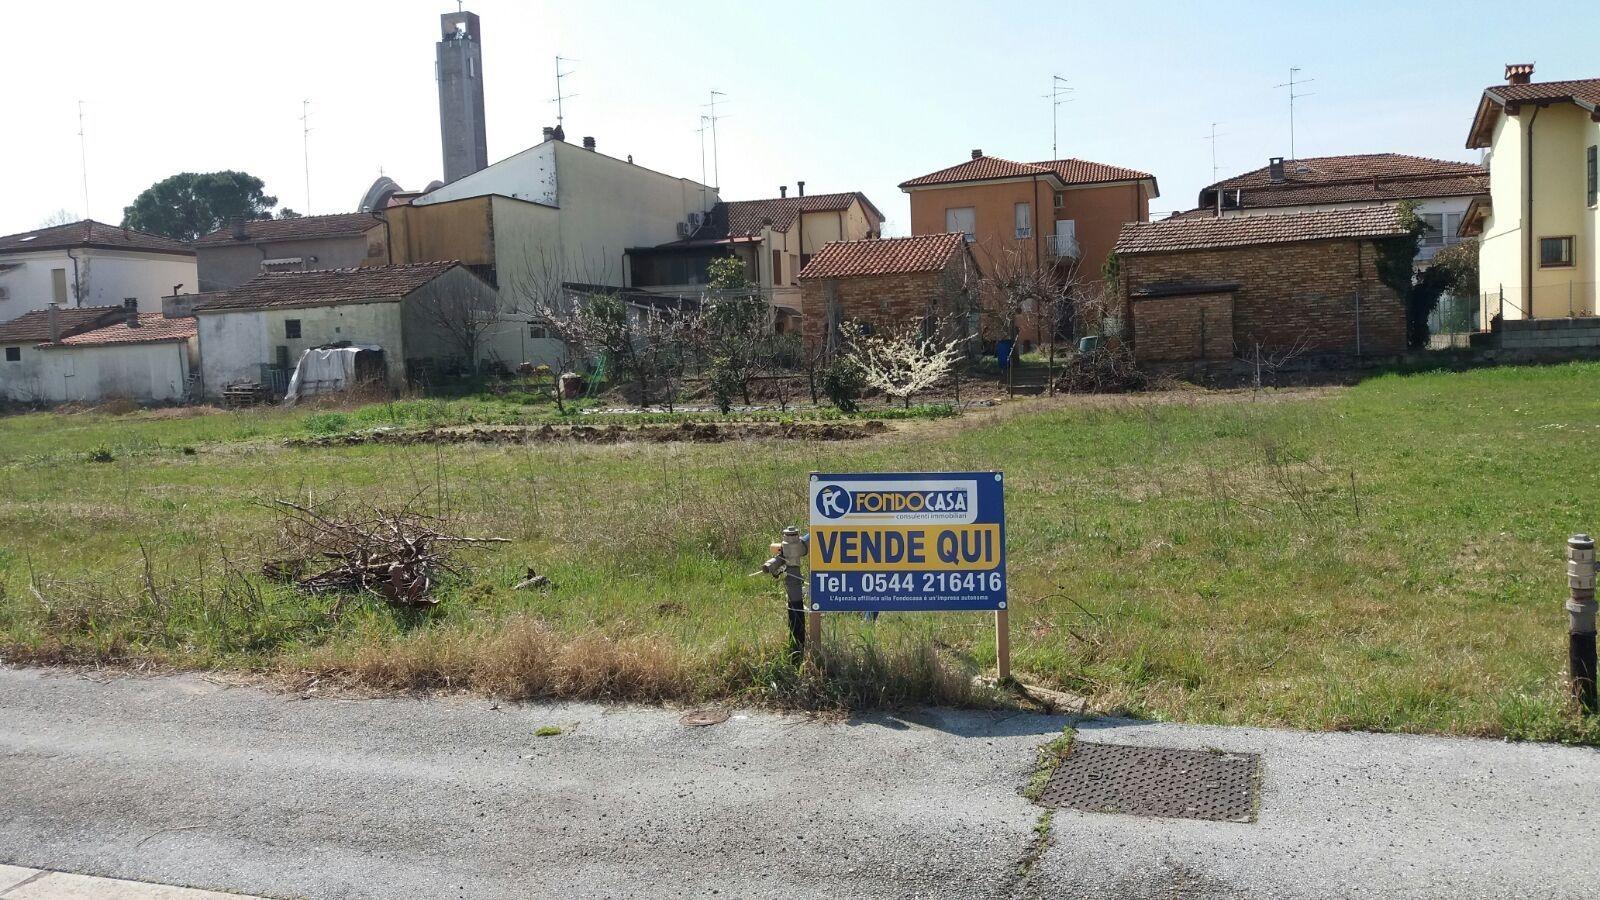 ravenna vendita quart: mezzano ravenna-san-biagio-casa-96-s.n.c.